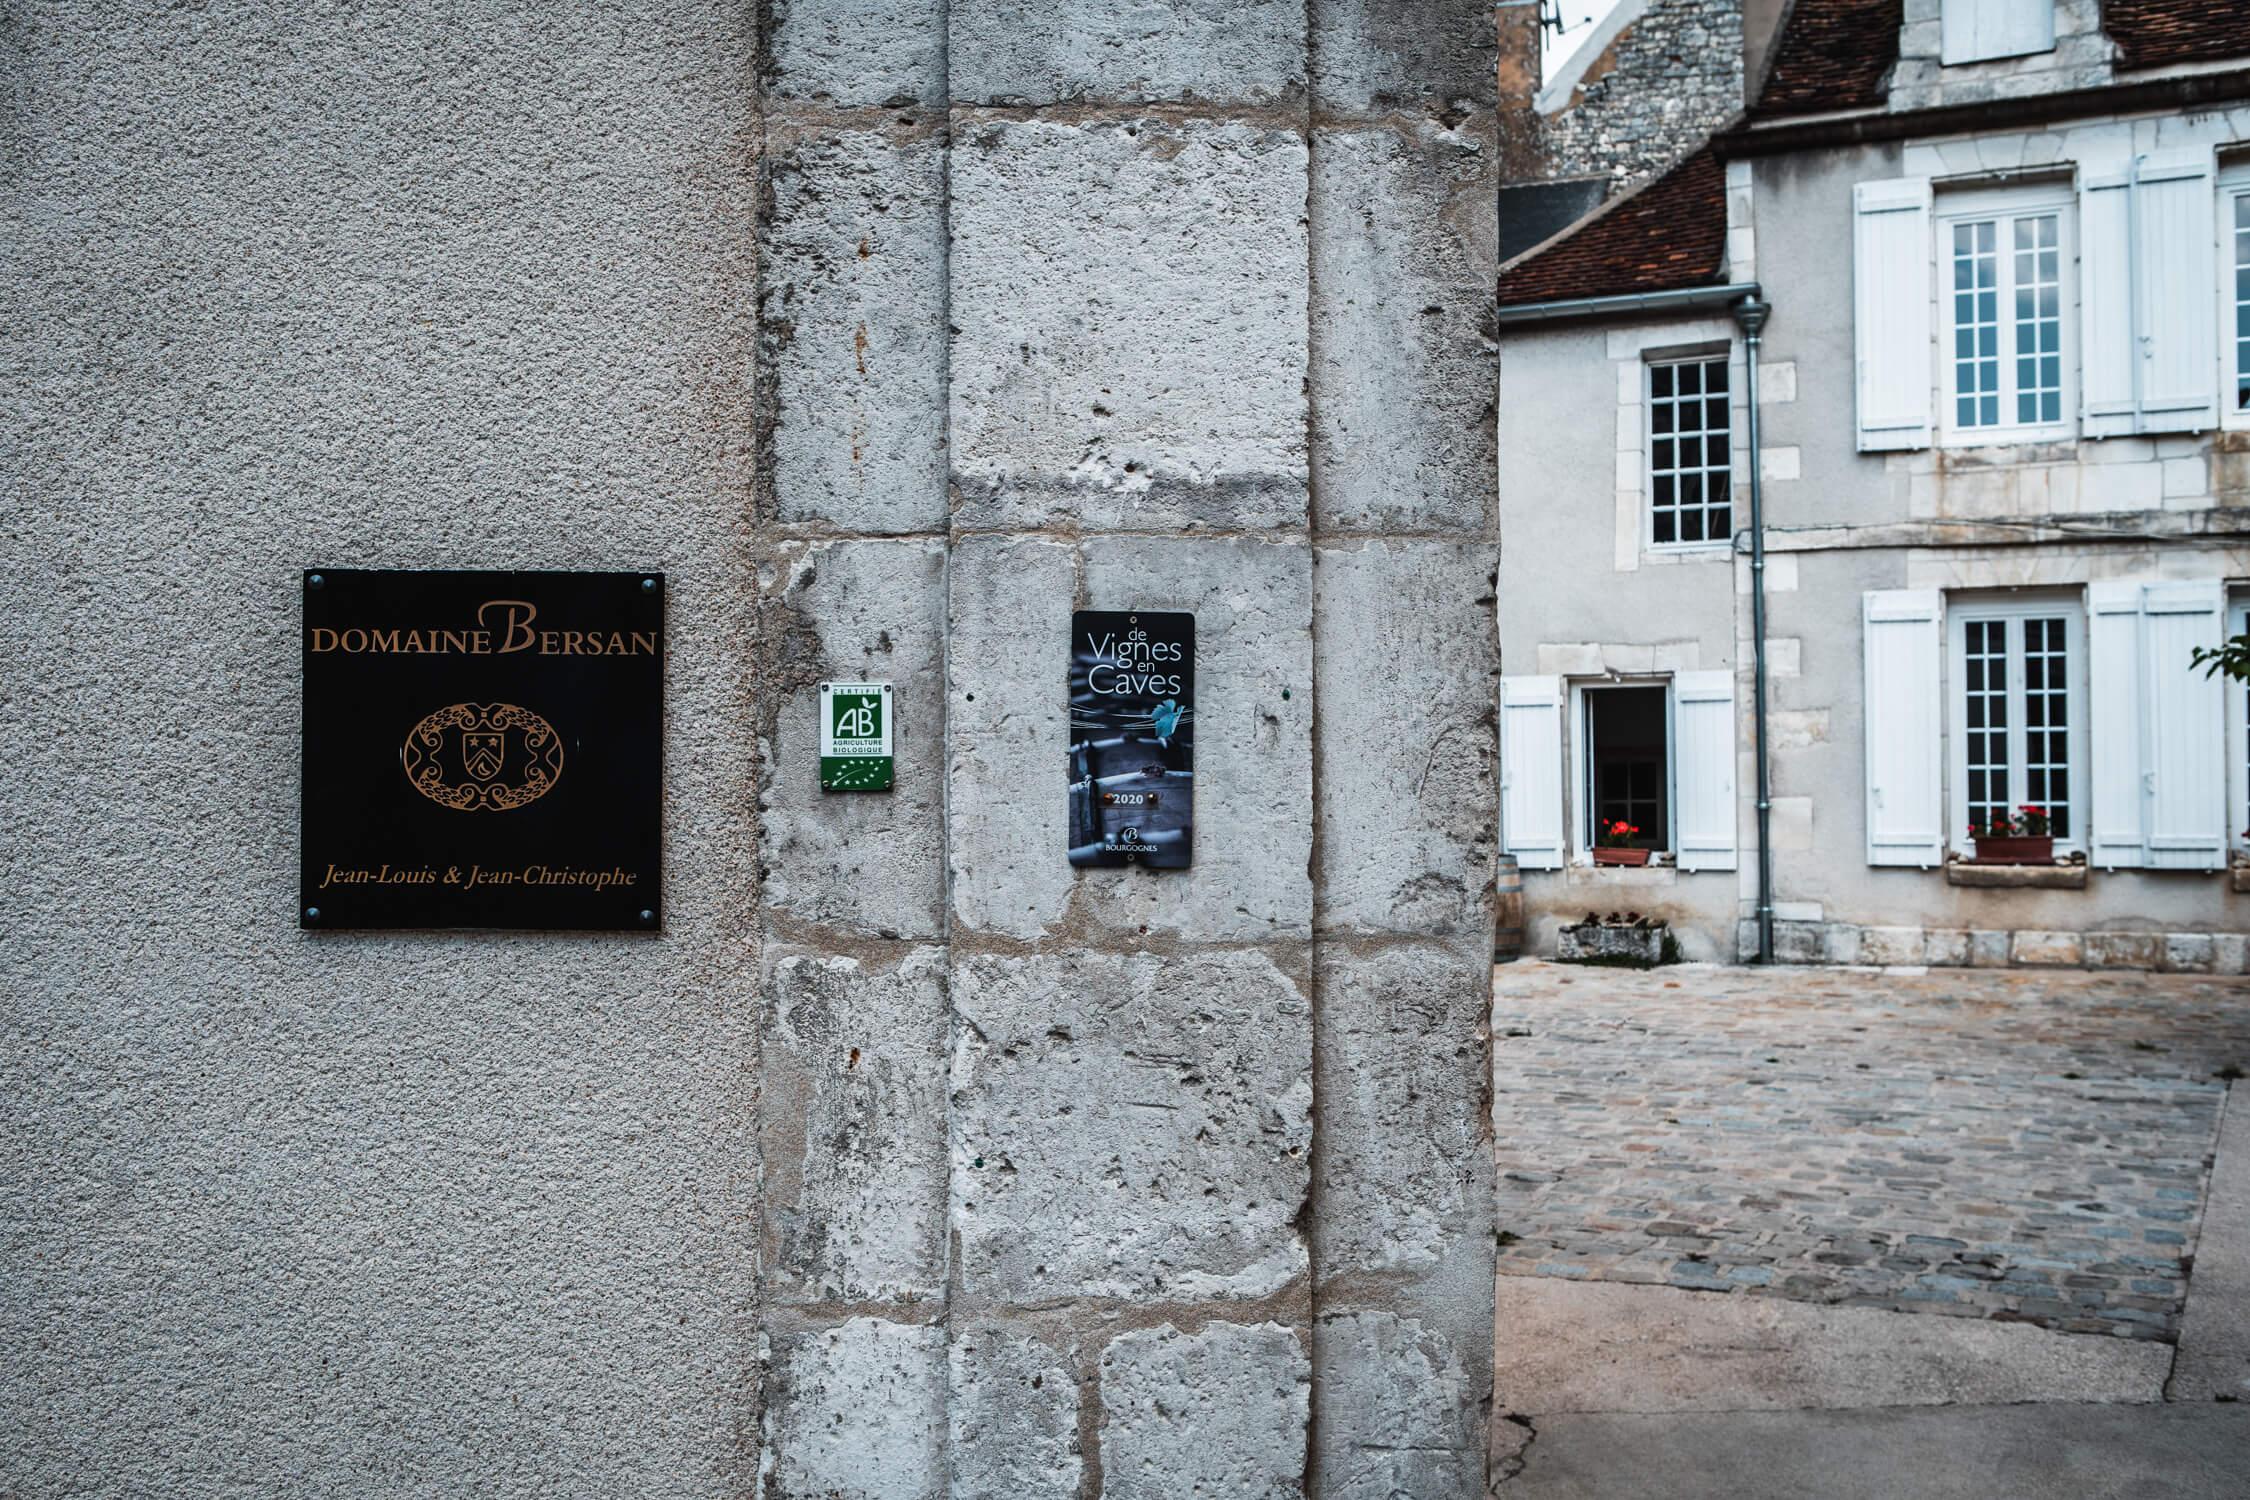 Entrance to Bersan wine estate